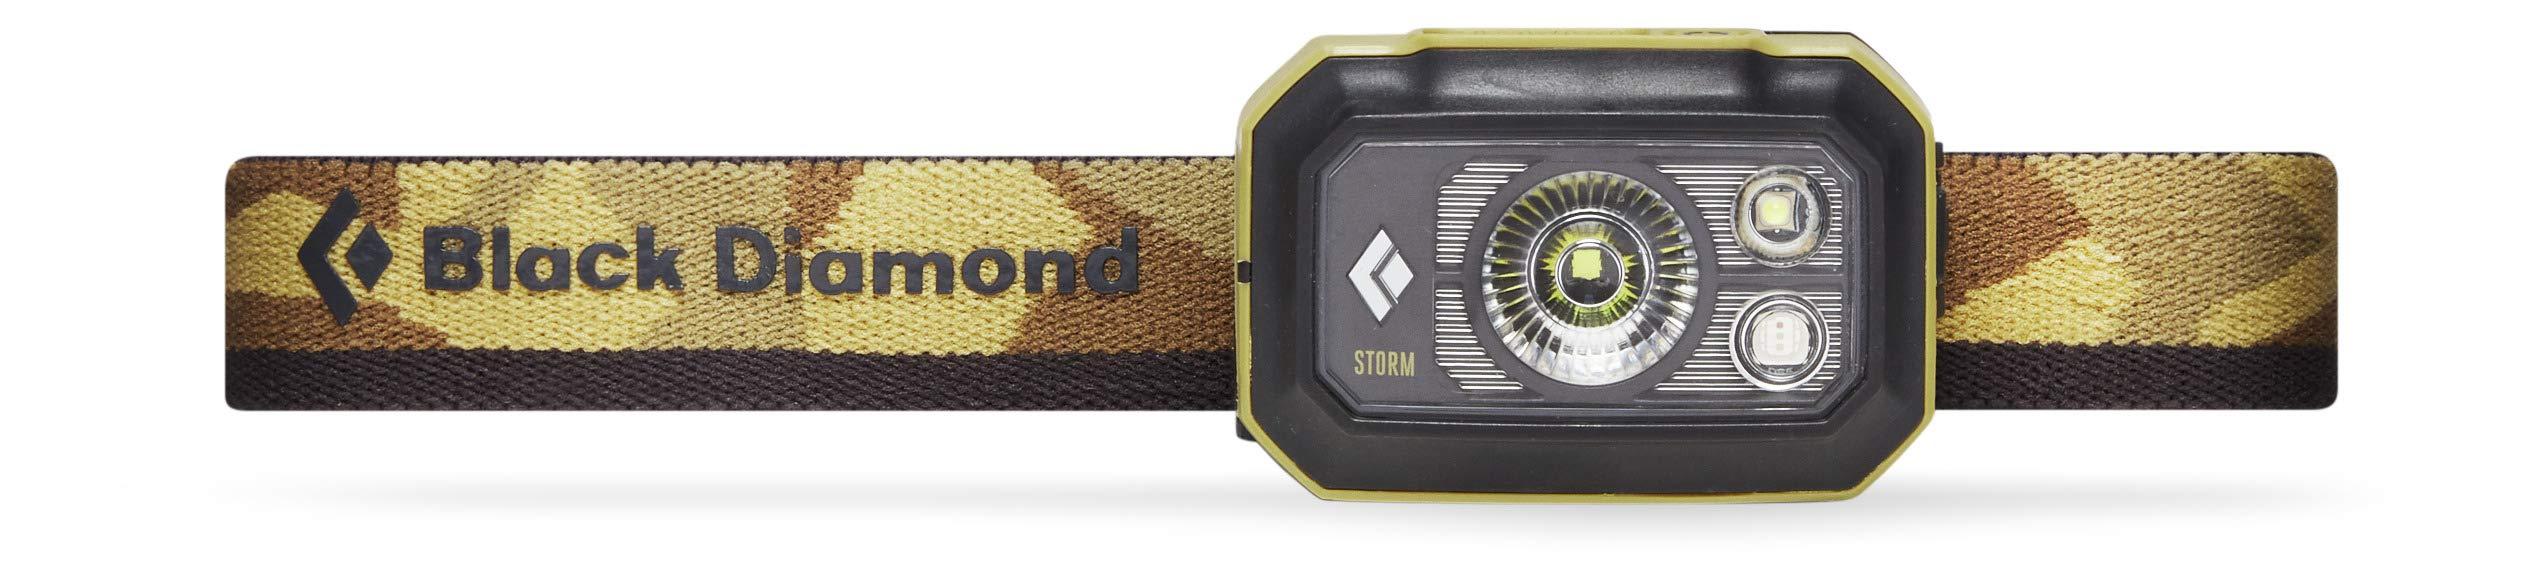 Black Diamond Unisex Storm 375 Headlamp Sand One Size by Black Diamond